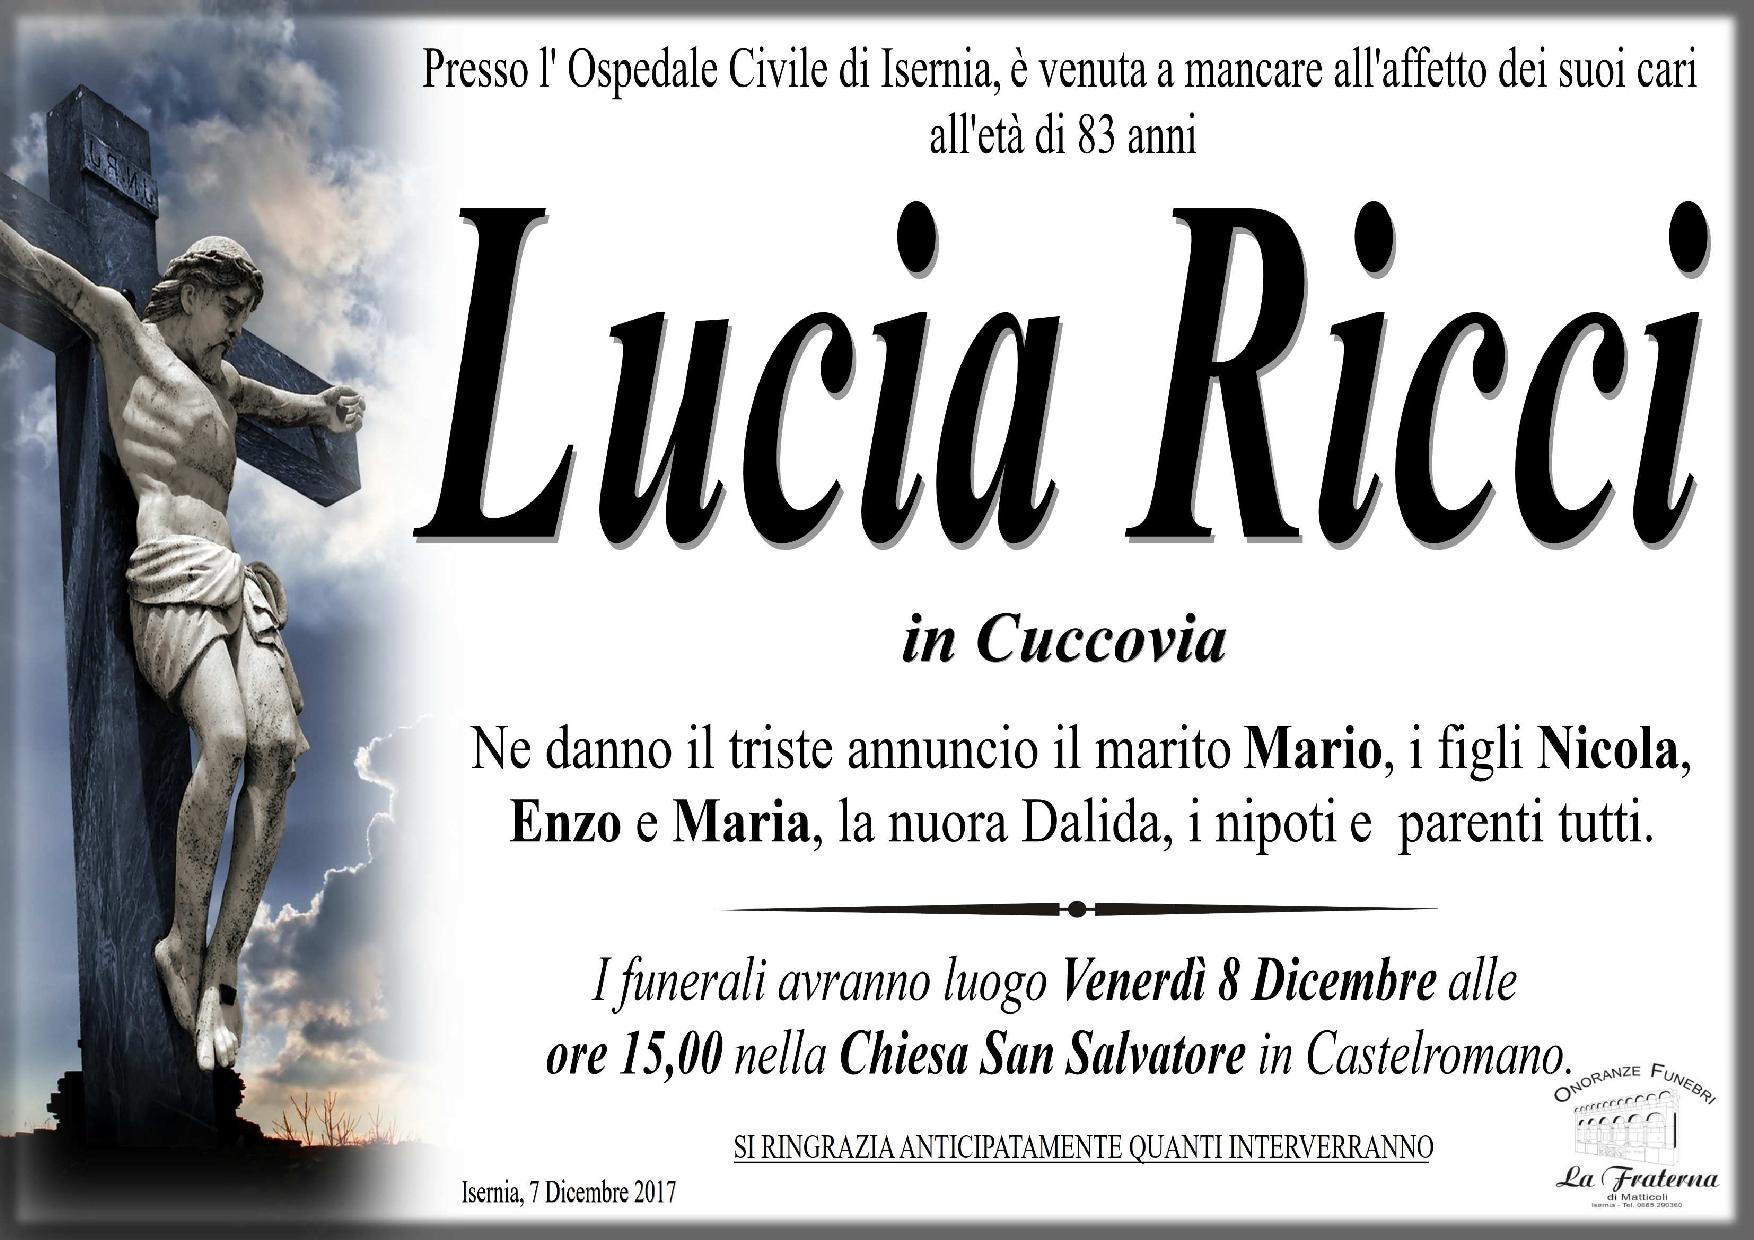 Lucia Ricci, 7/12/2017, Isernia – Onoranze Funebri La Fraterna